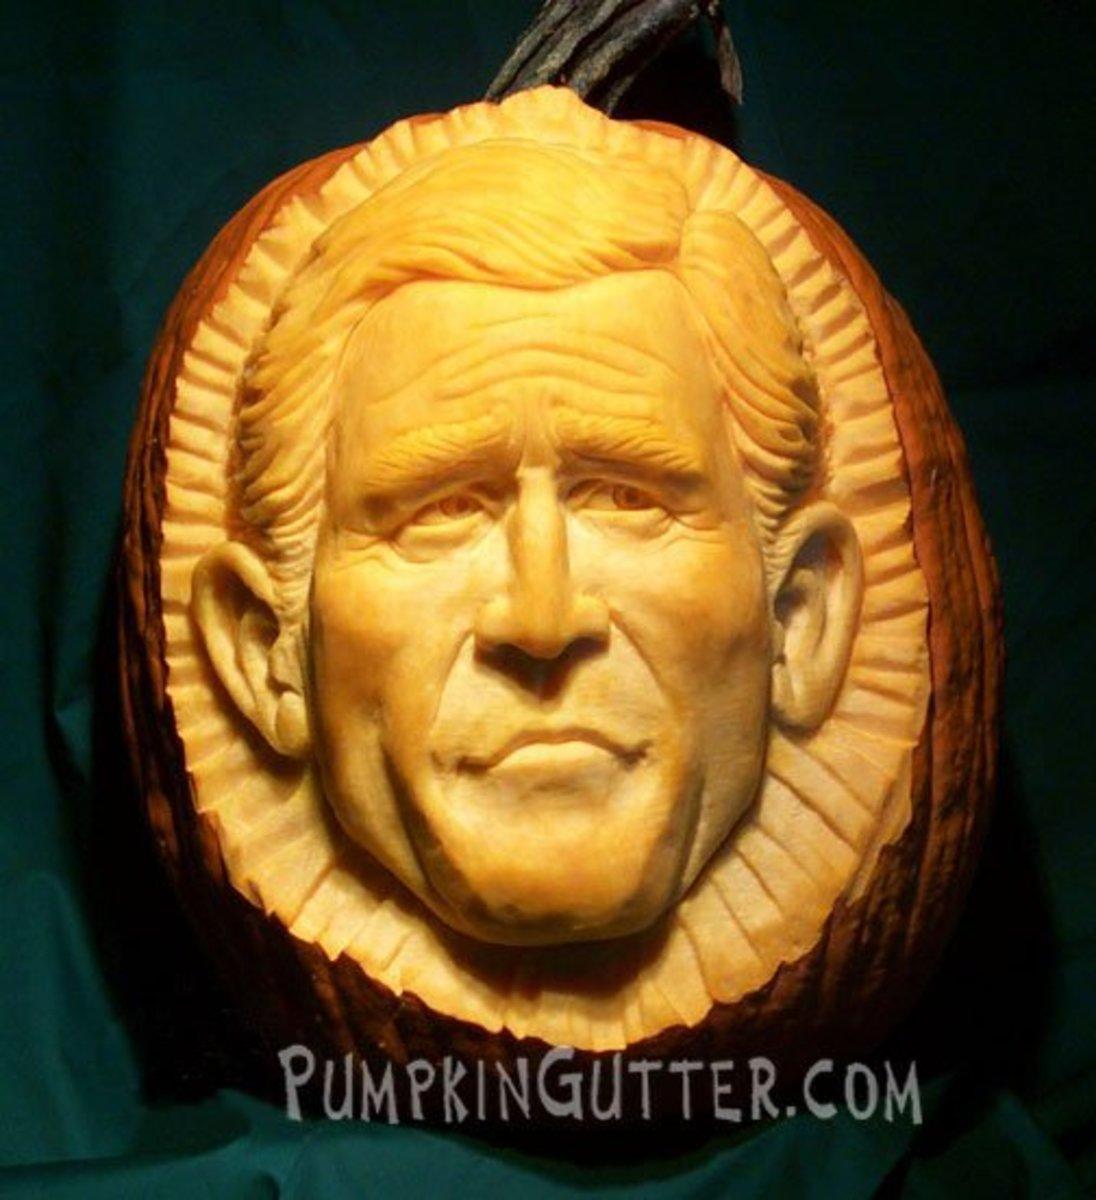 George W. Bush pumpkin